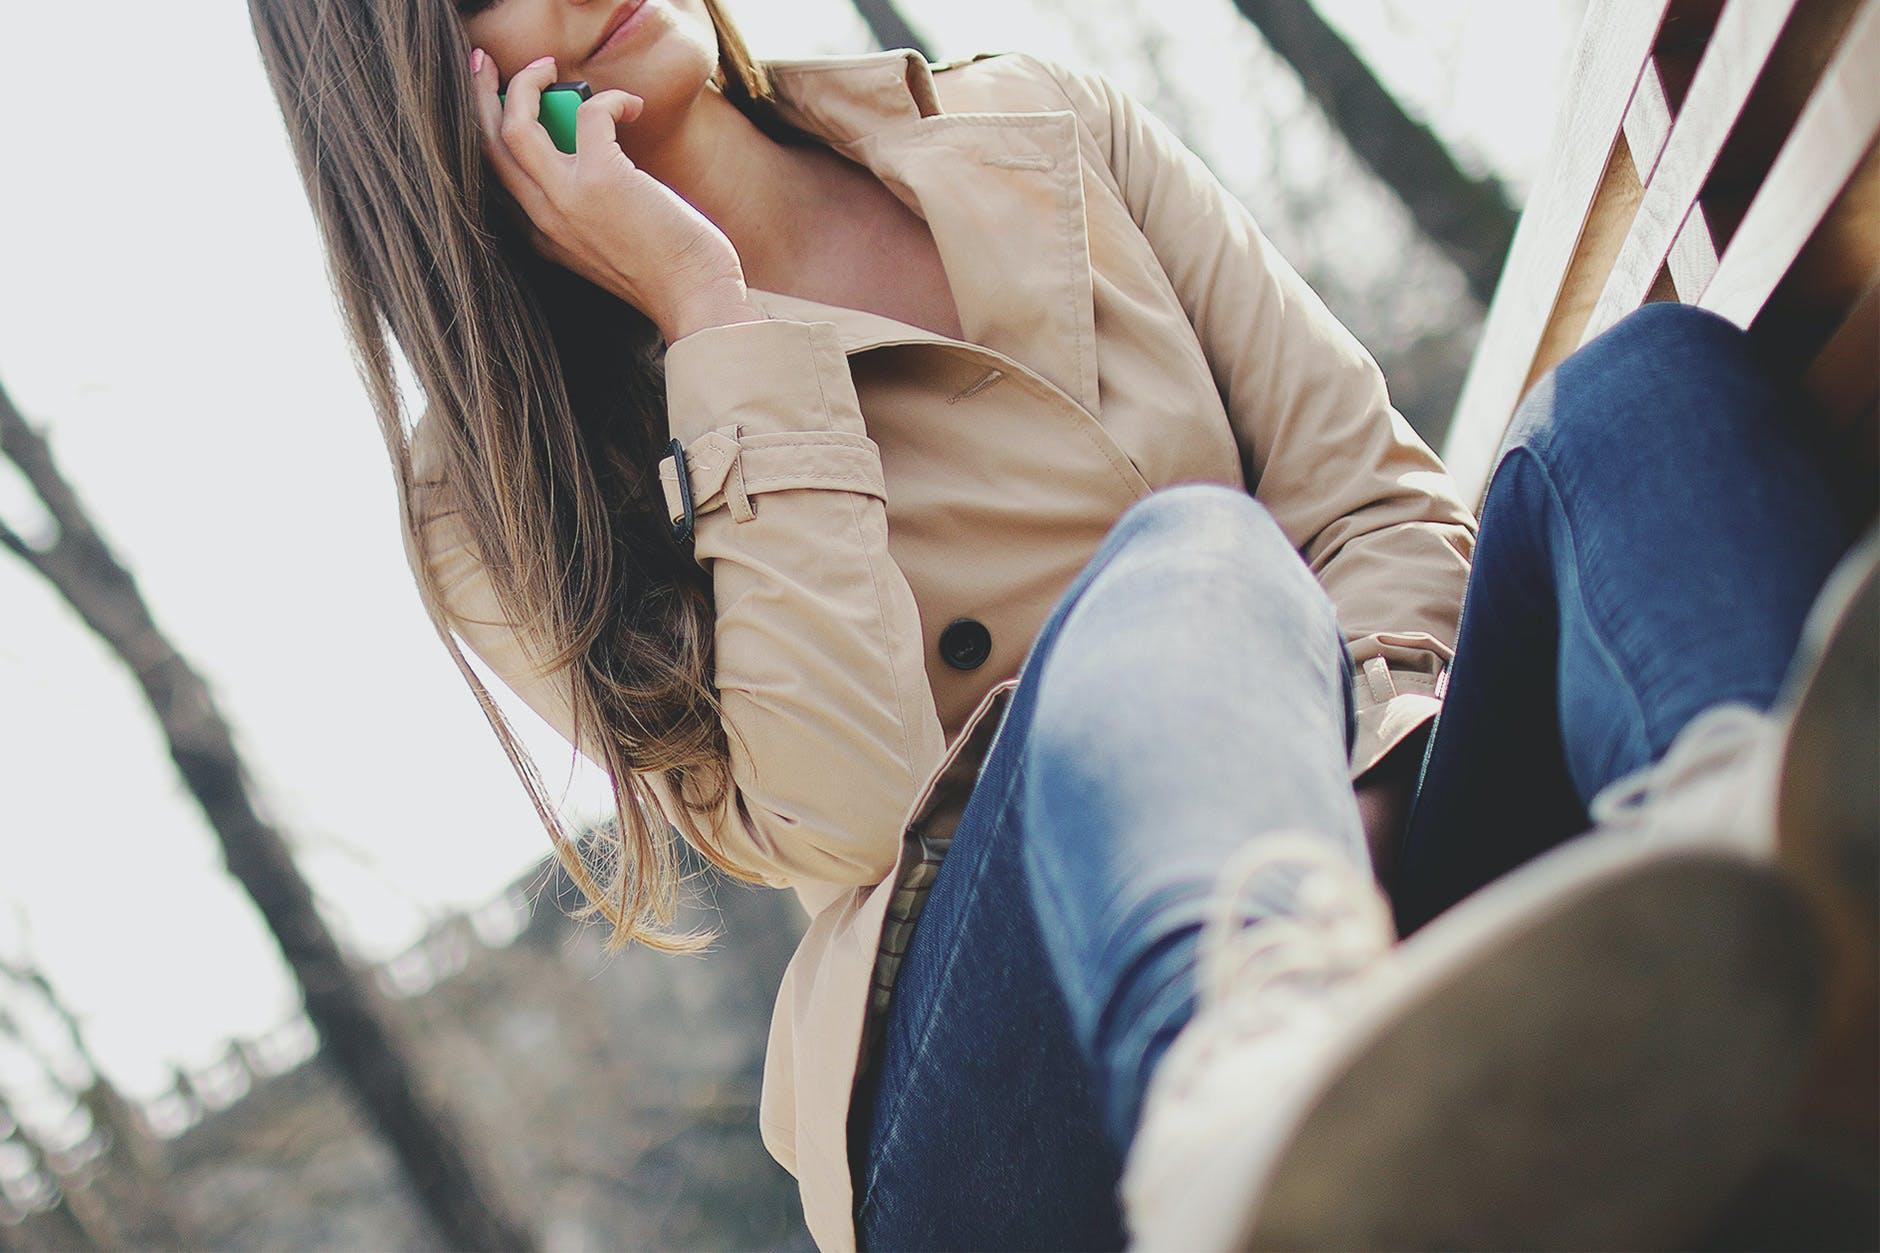 Free stock photo of fashion, person, woman, smartphone